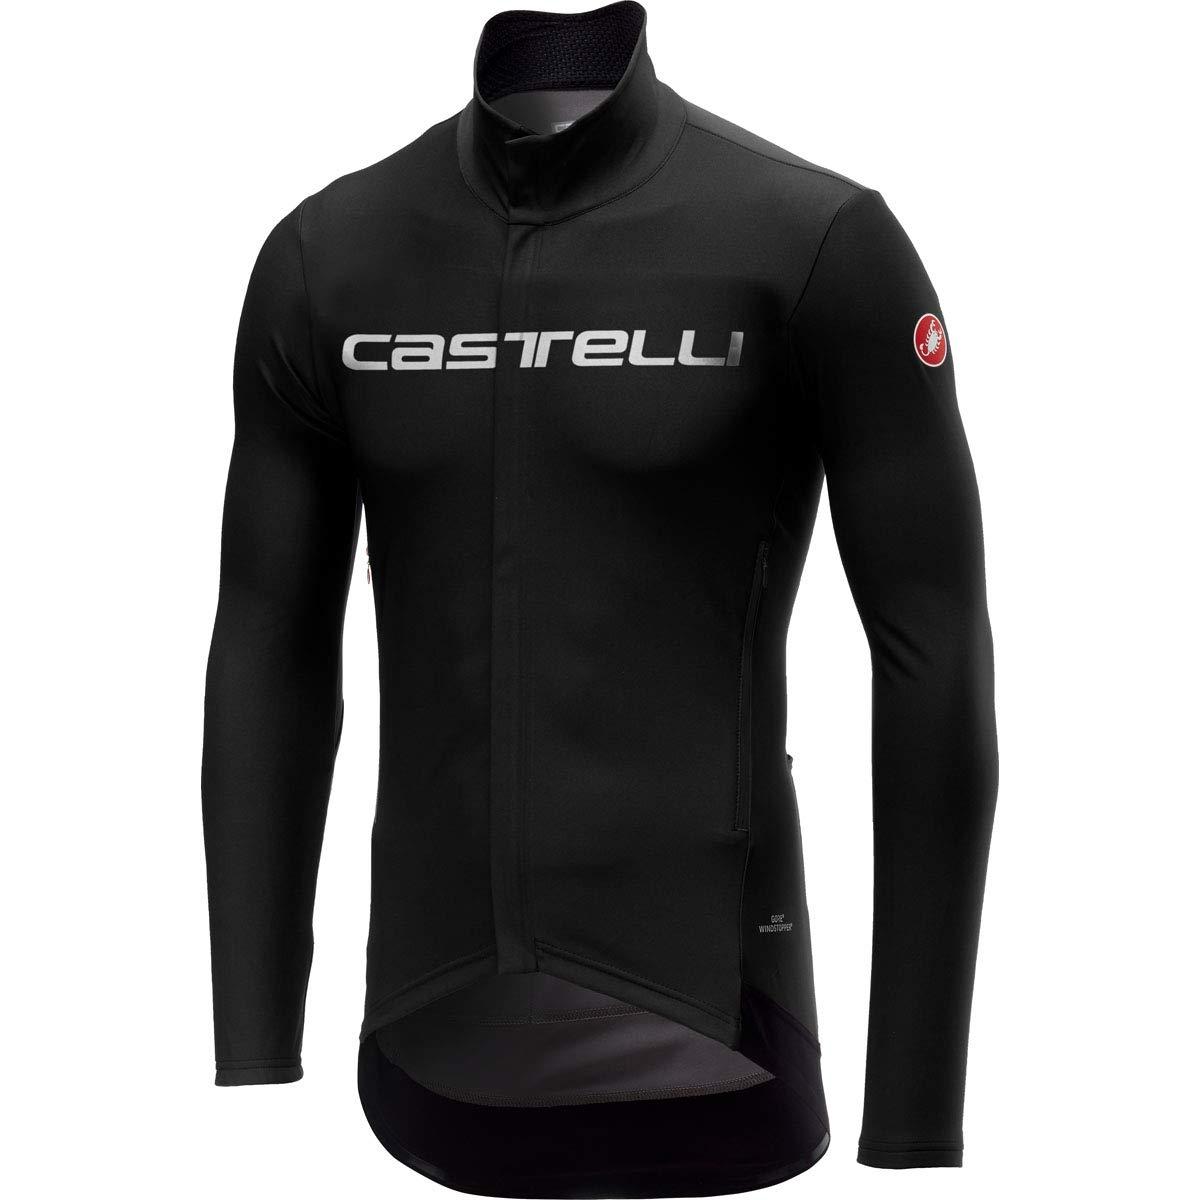 Castelli Perfetto 長袖 LE Large ブラック B07H8QDCSC